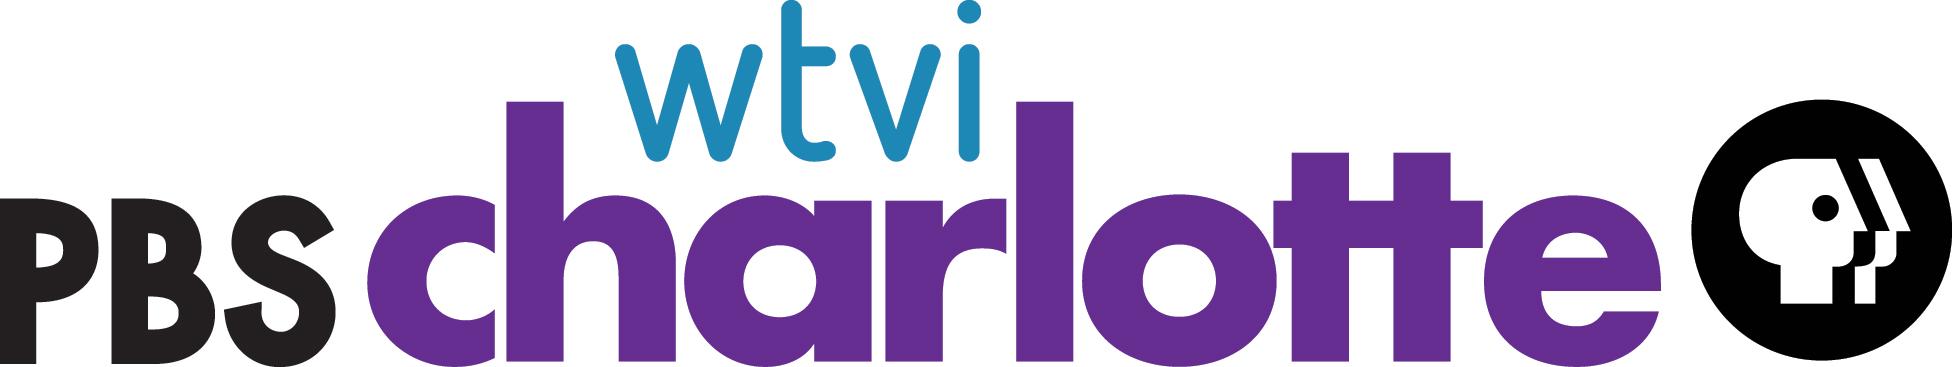 wtvi logopedia the logo and branding site